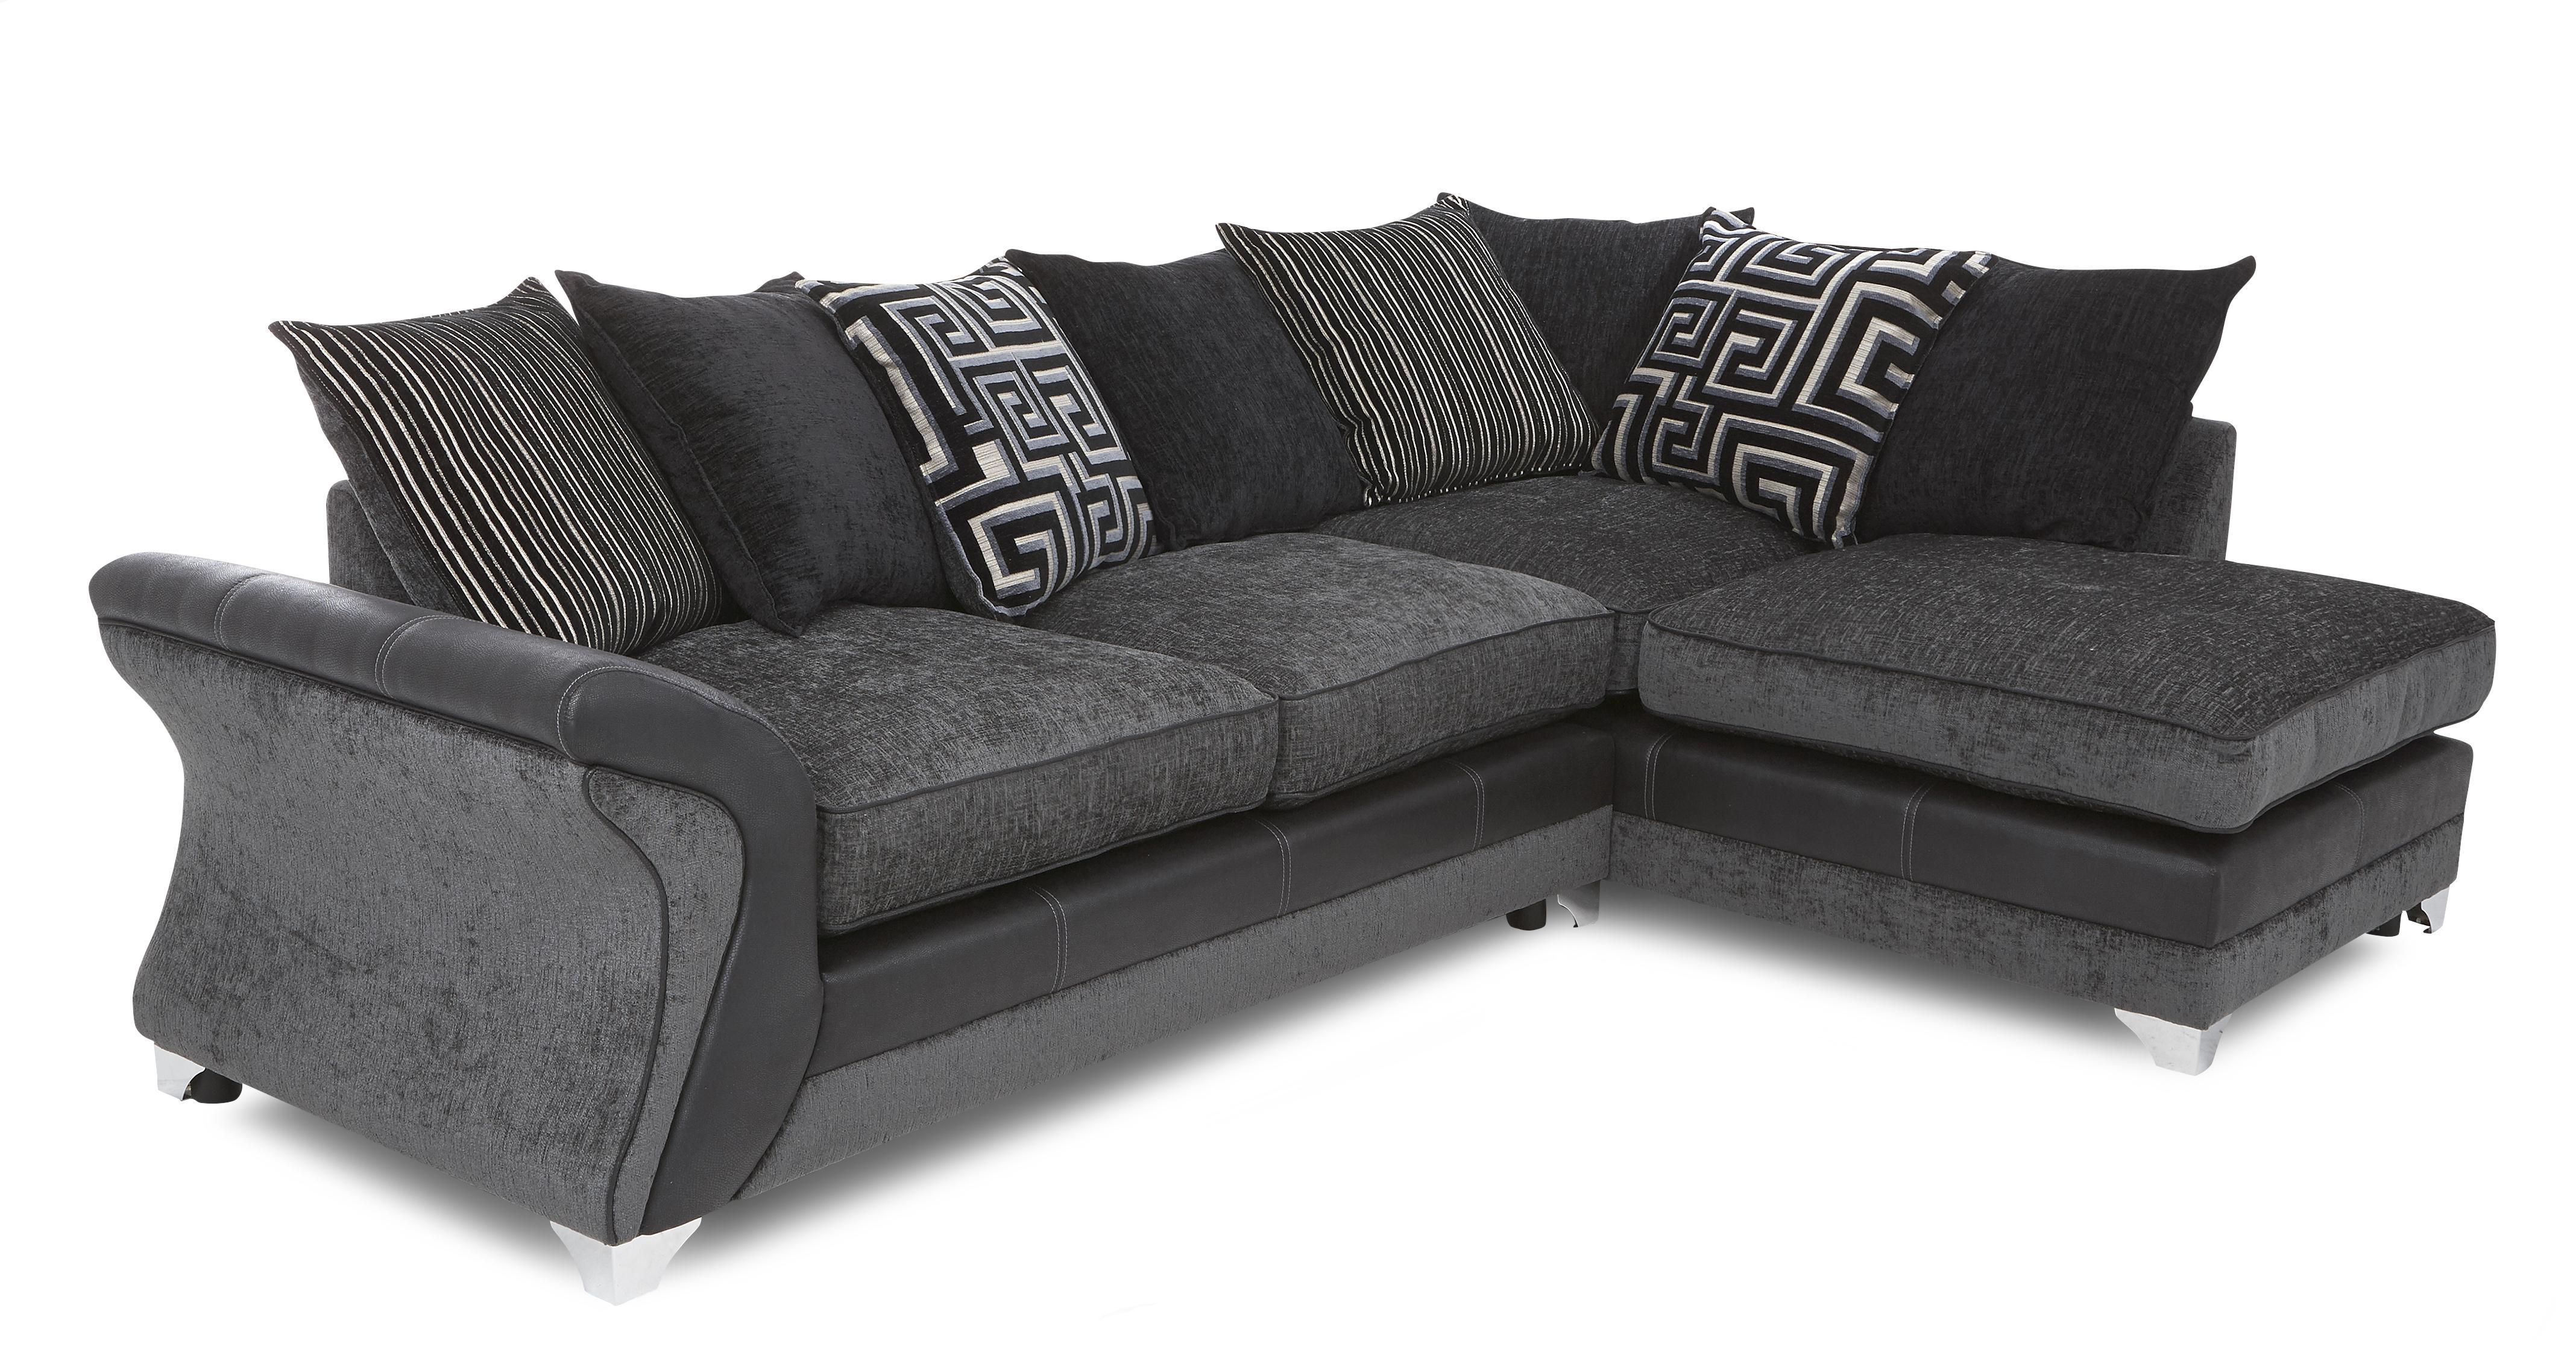 dfs corner sofa and swivel chair dhi buchannan microfiber reviews dare charcoal fabric set inc chaise